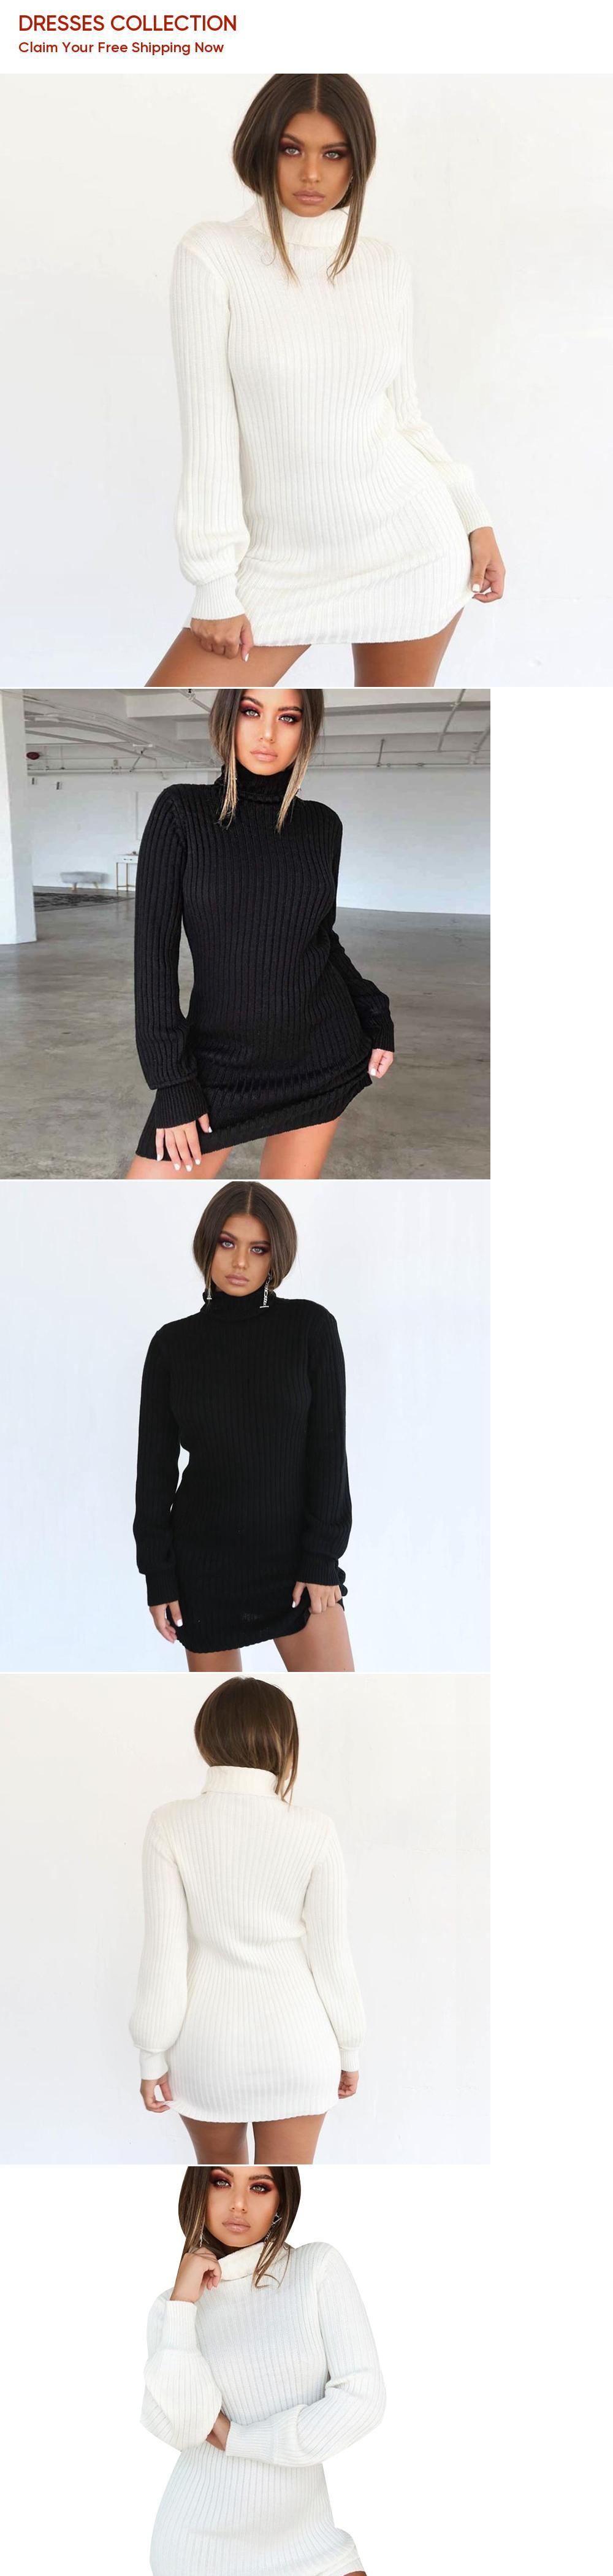 6aacfd52de572 BEFORW Autumn Casual Knitted Sweater Dress Turtleneck Long Sleeve ...